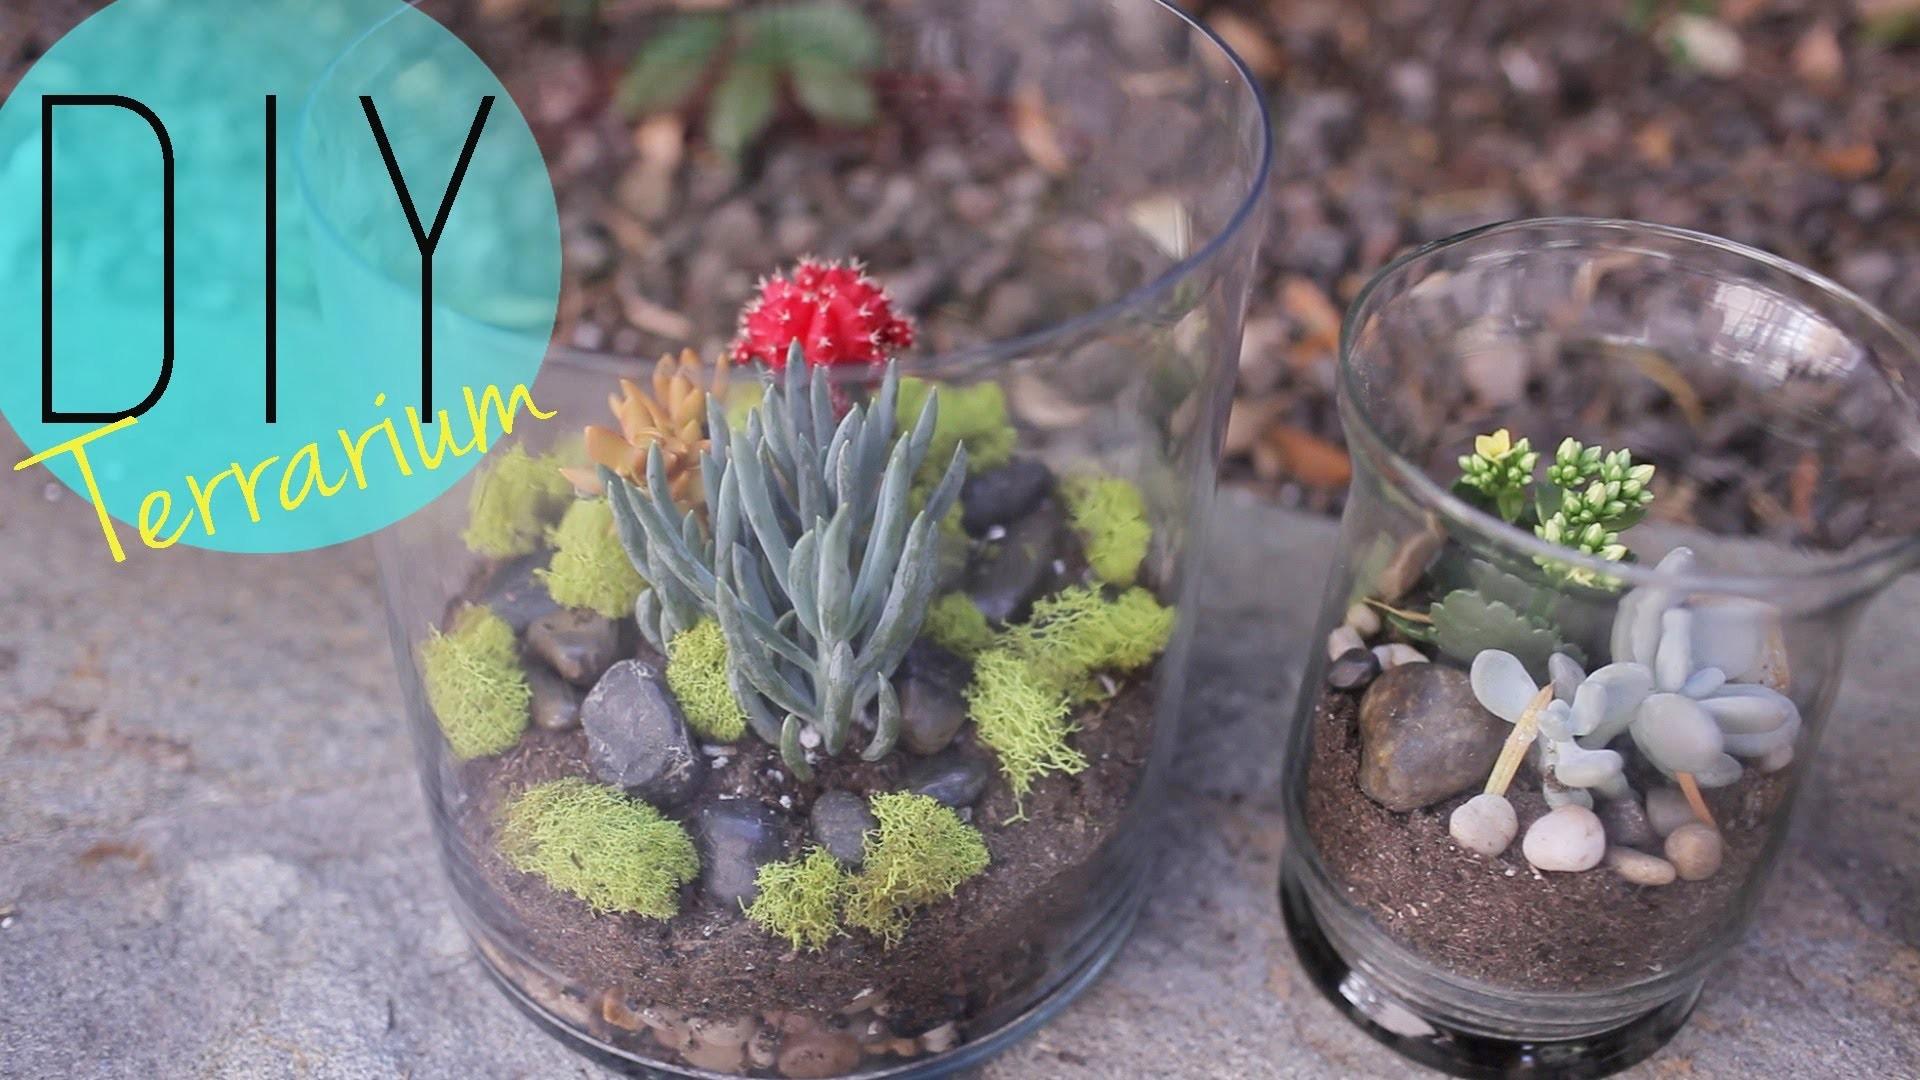 DIY Indoor Garden - Cactus Terrarium {How to} by ANNEORSHINE